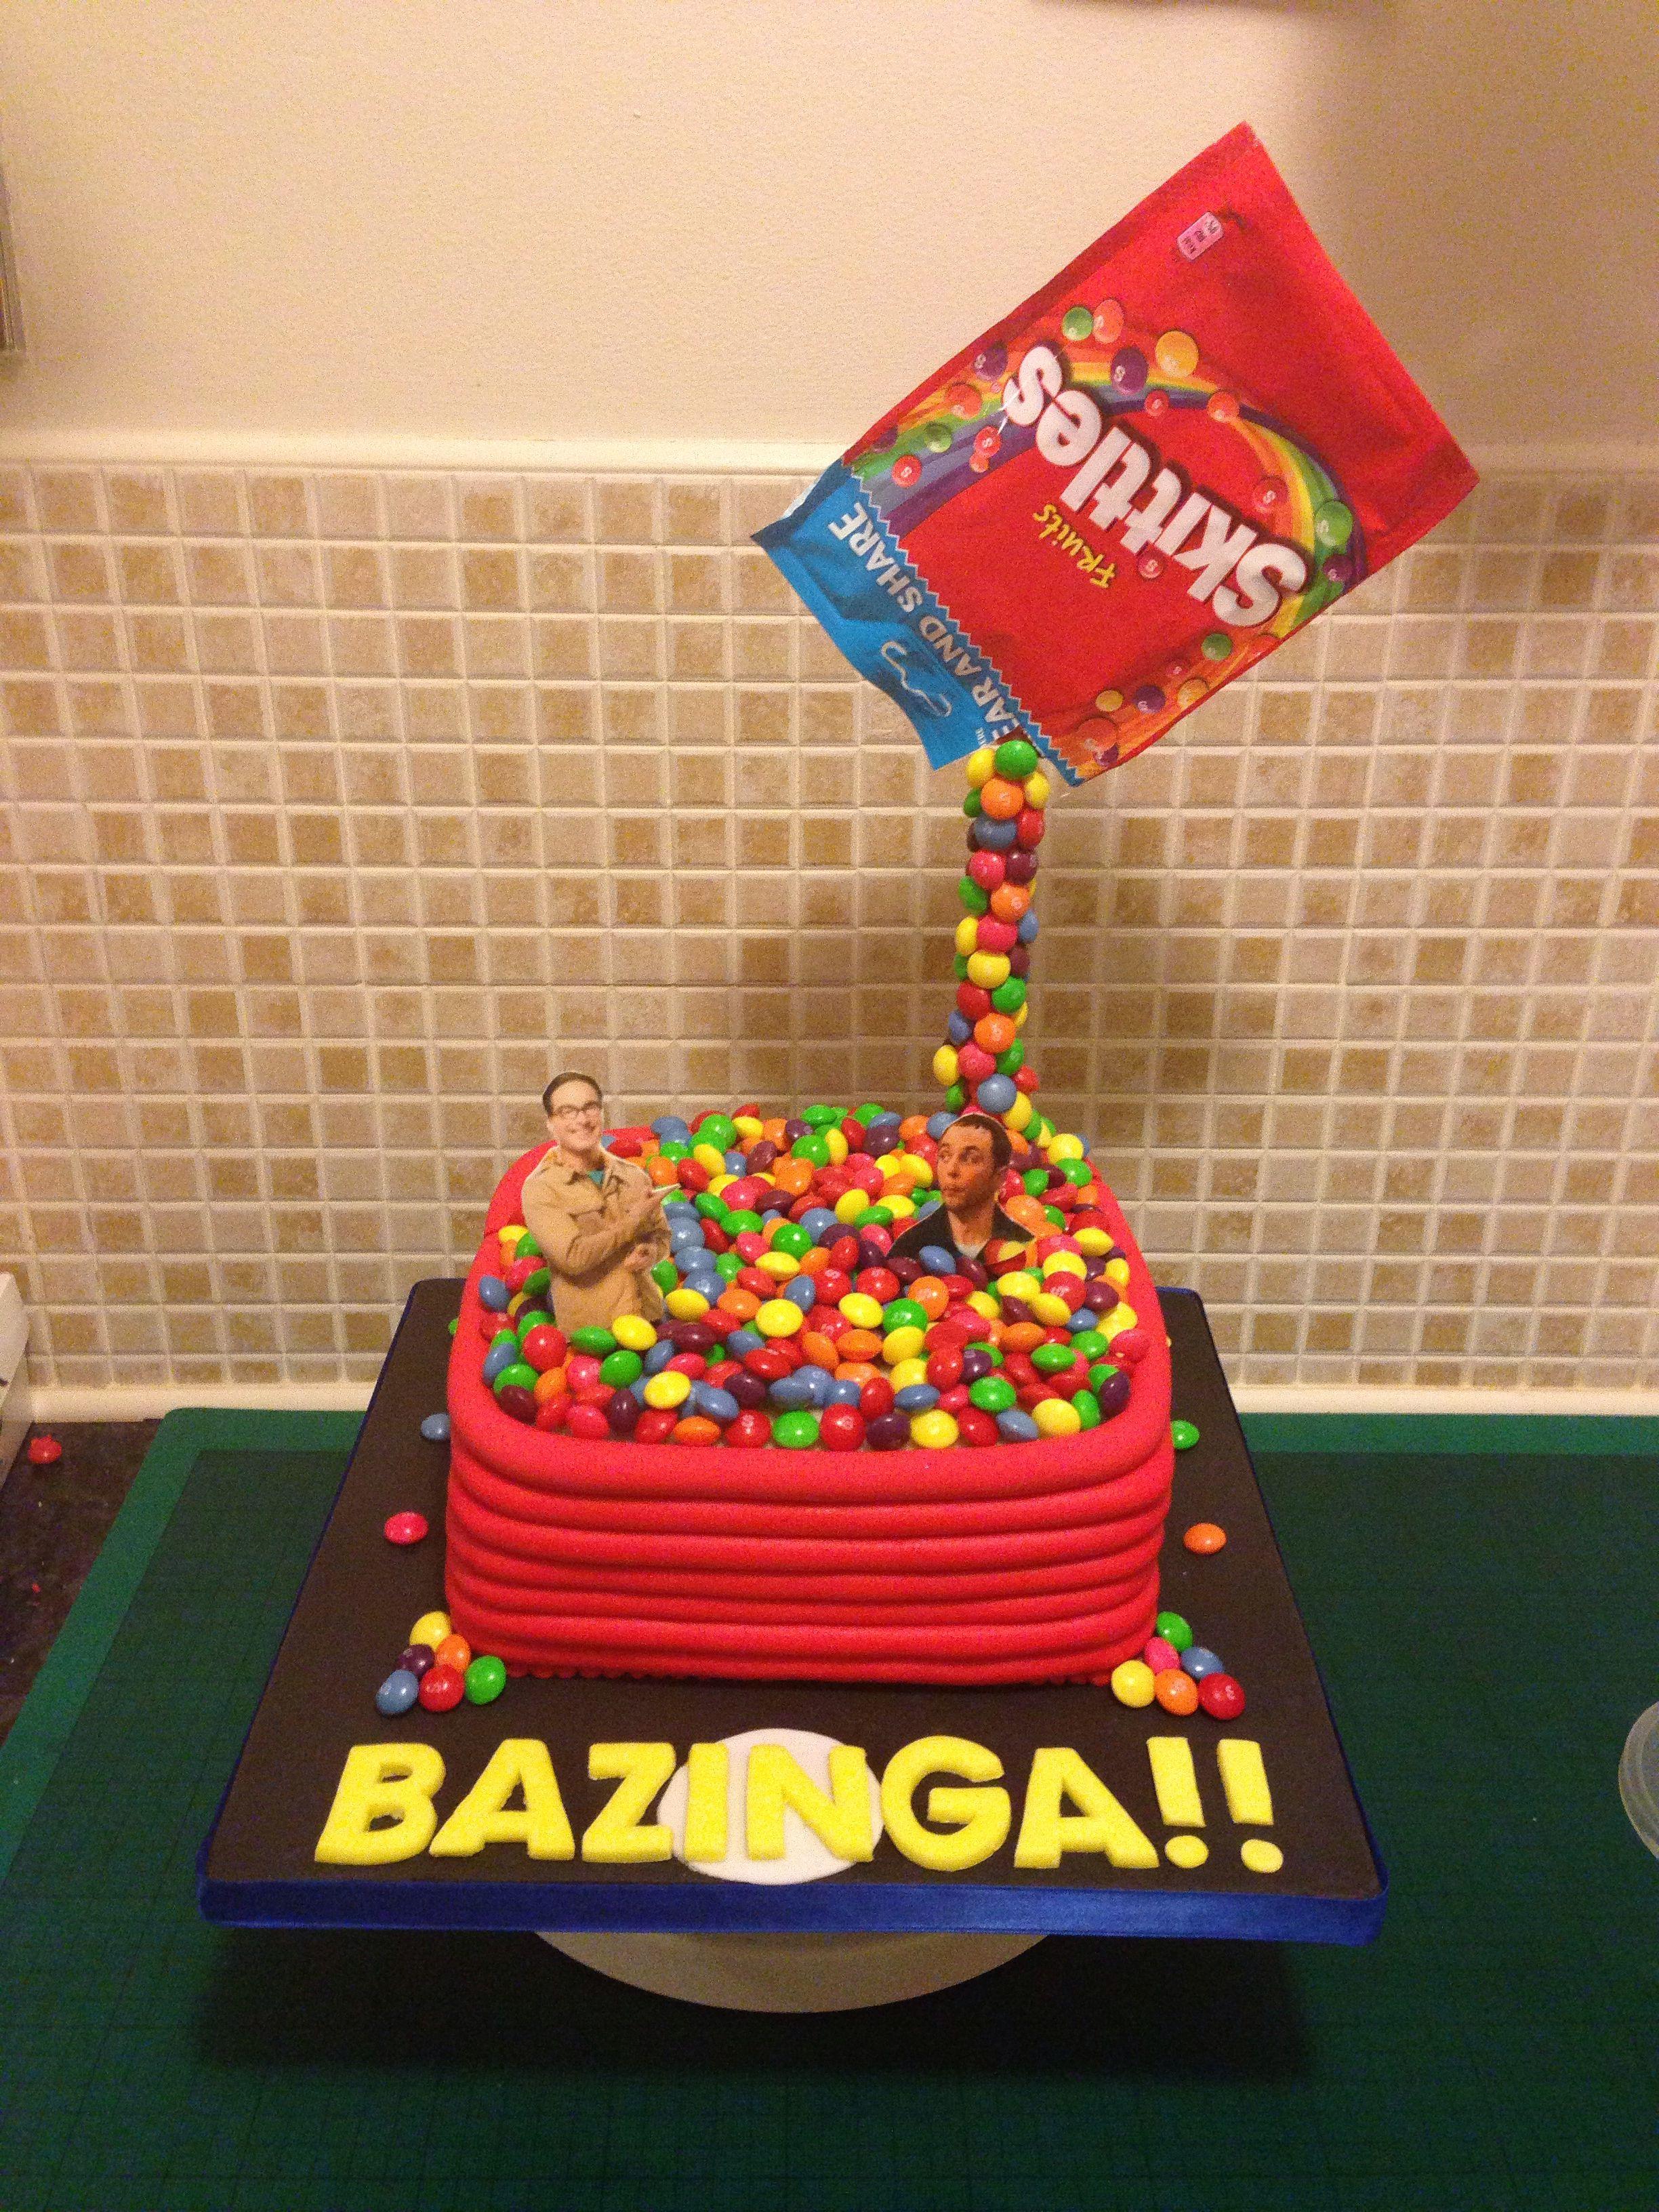 Skittles Gravity Cake Big Bang Theory Ball Pool